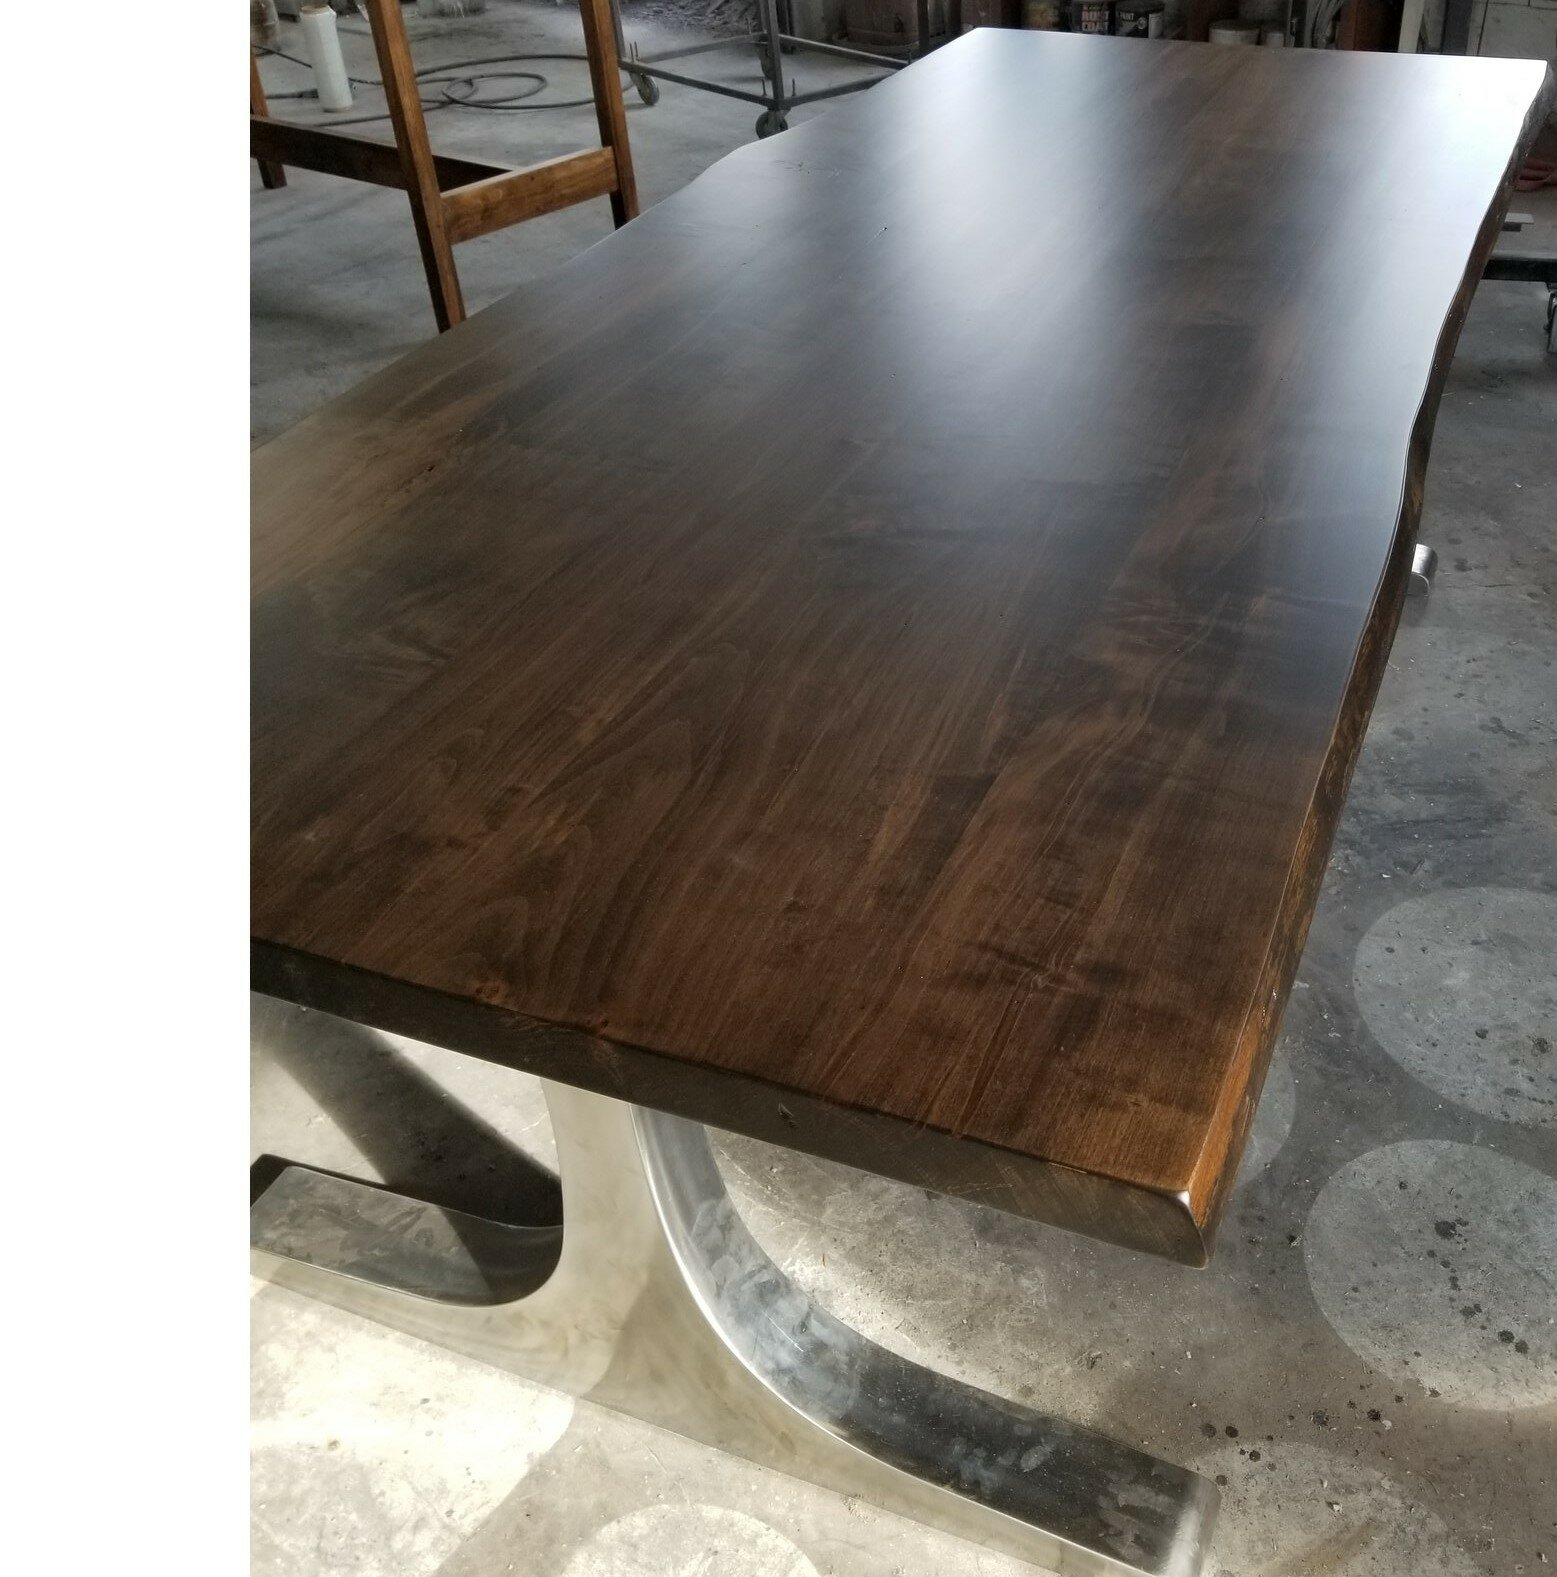 Union Rustic Selden Dining Table | Wayfair